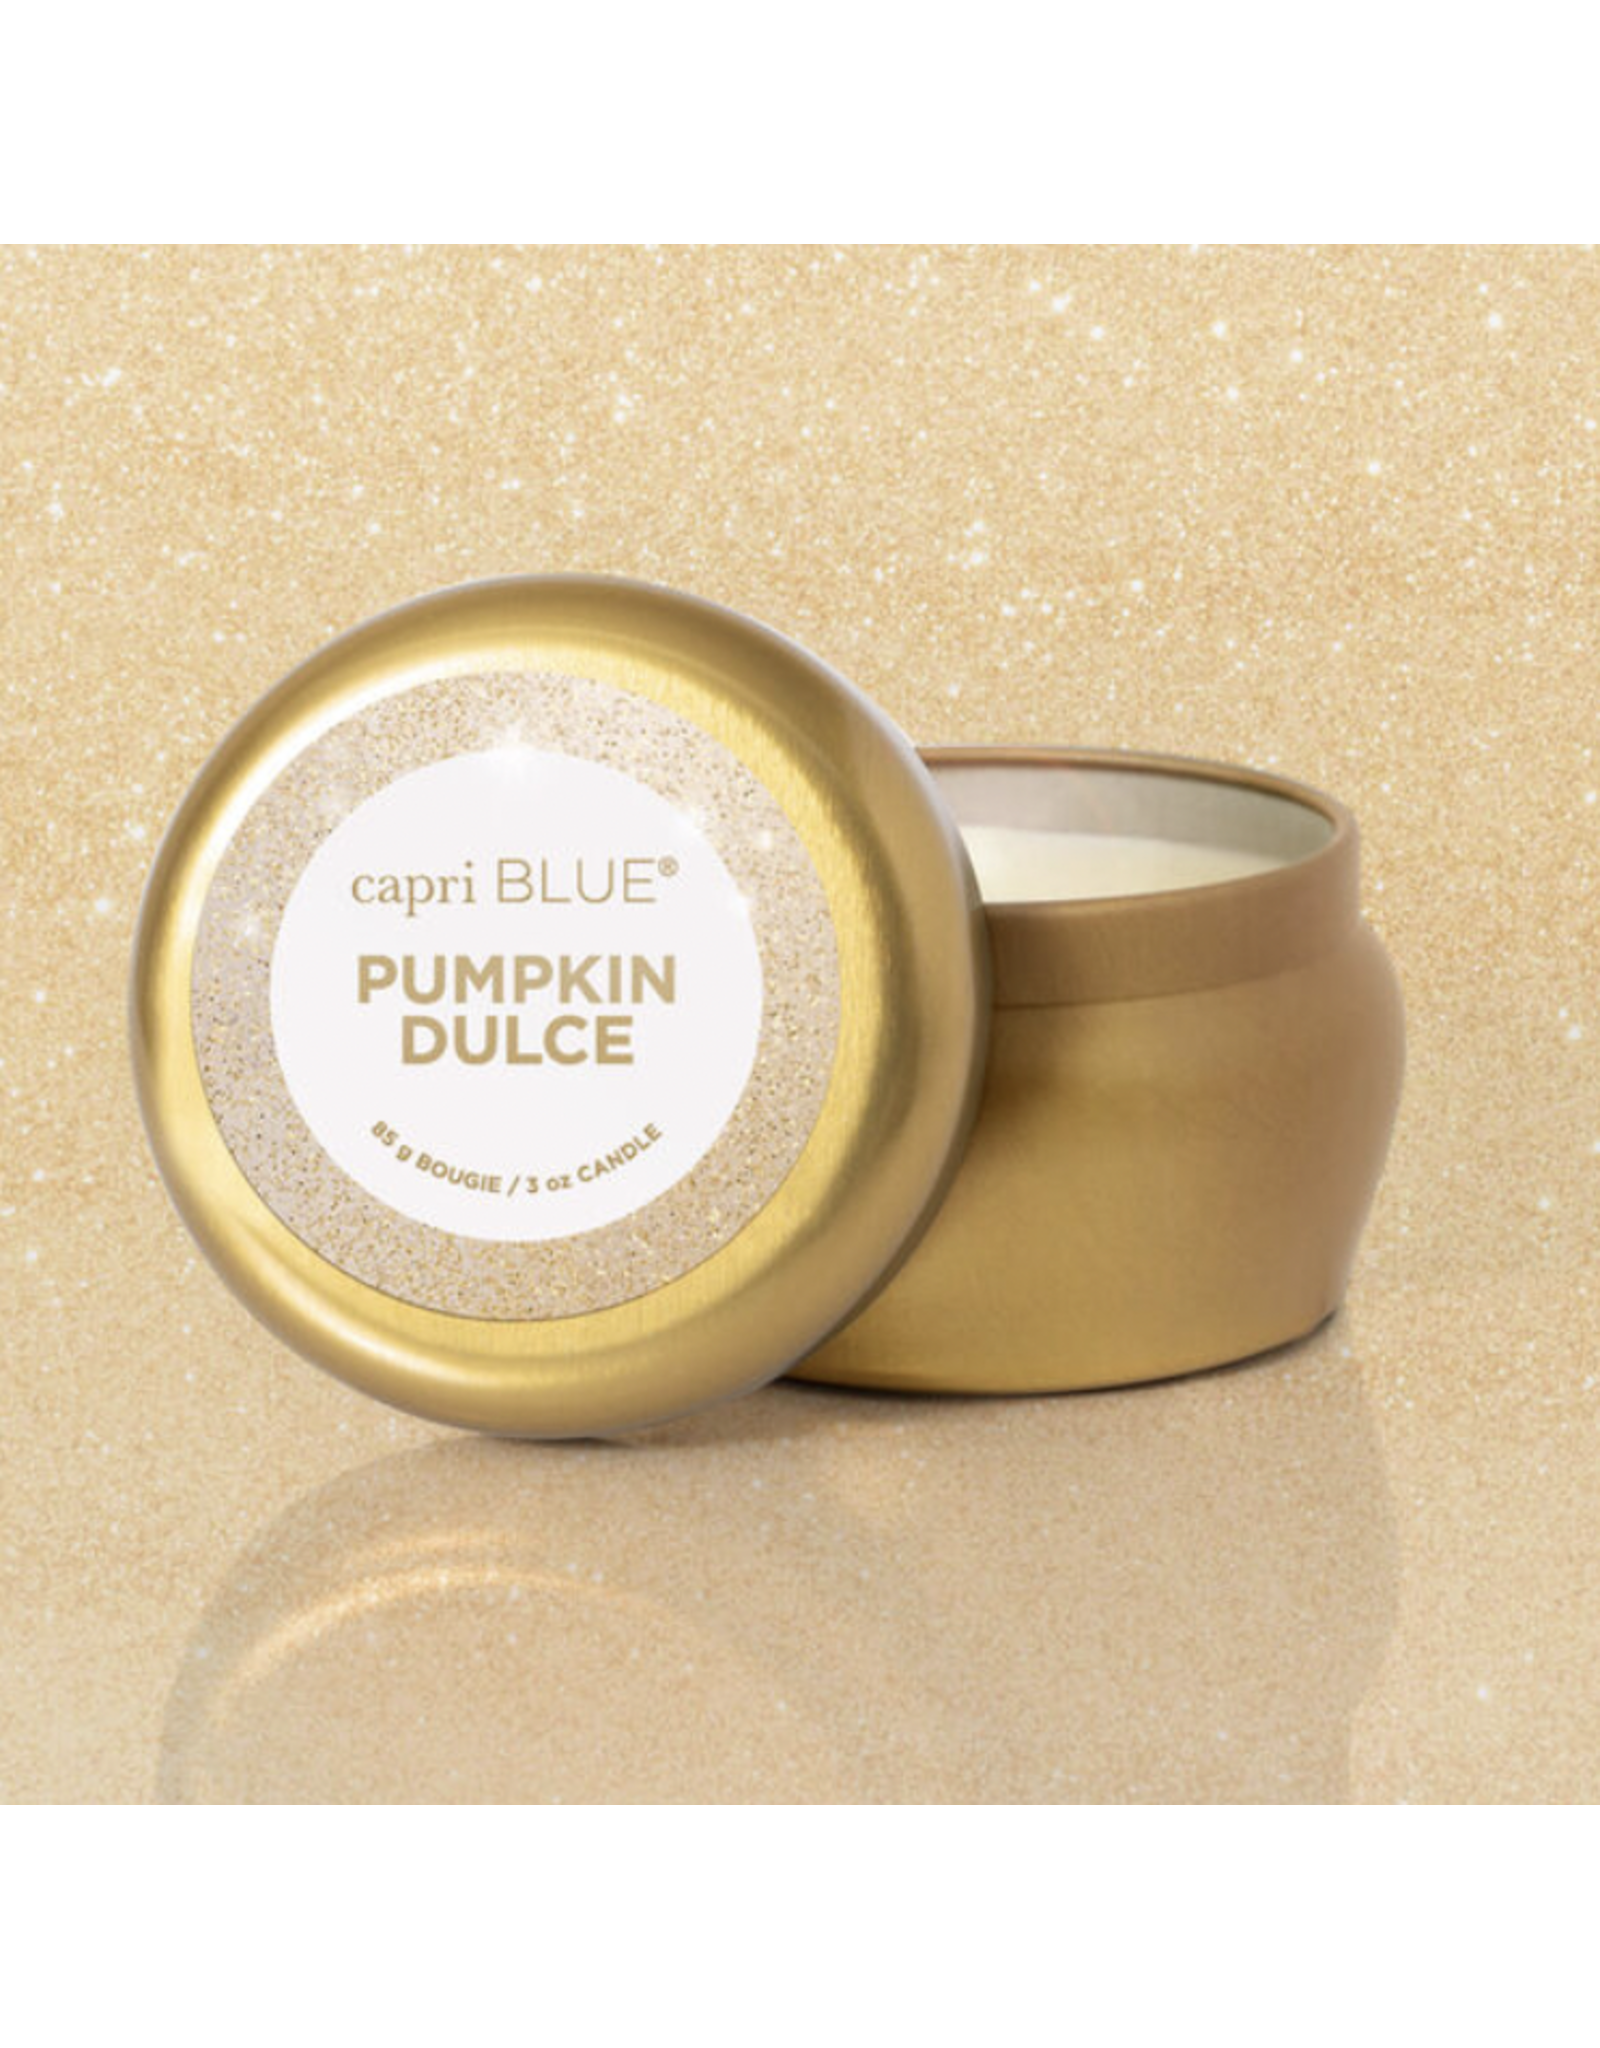 Pumpkin Dulce candle, Glam Mini Tin